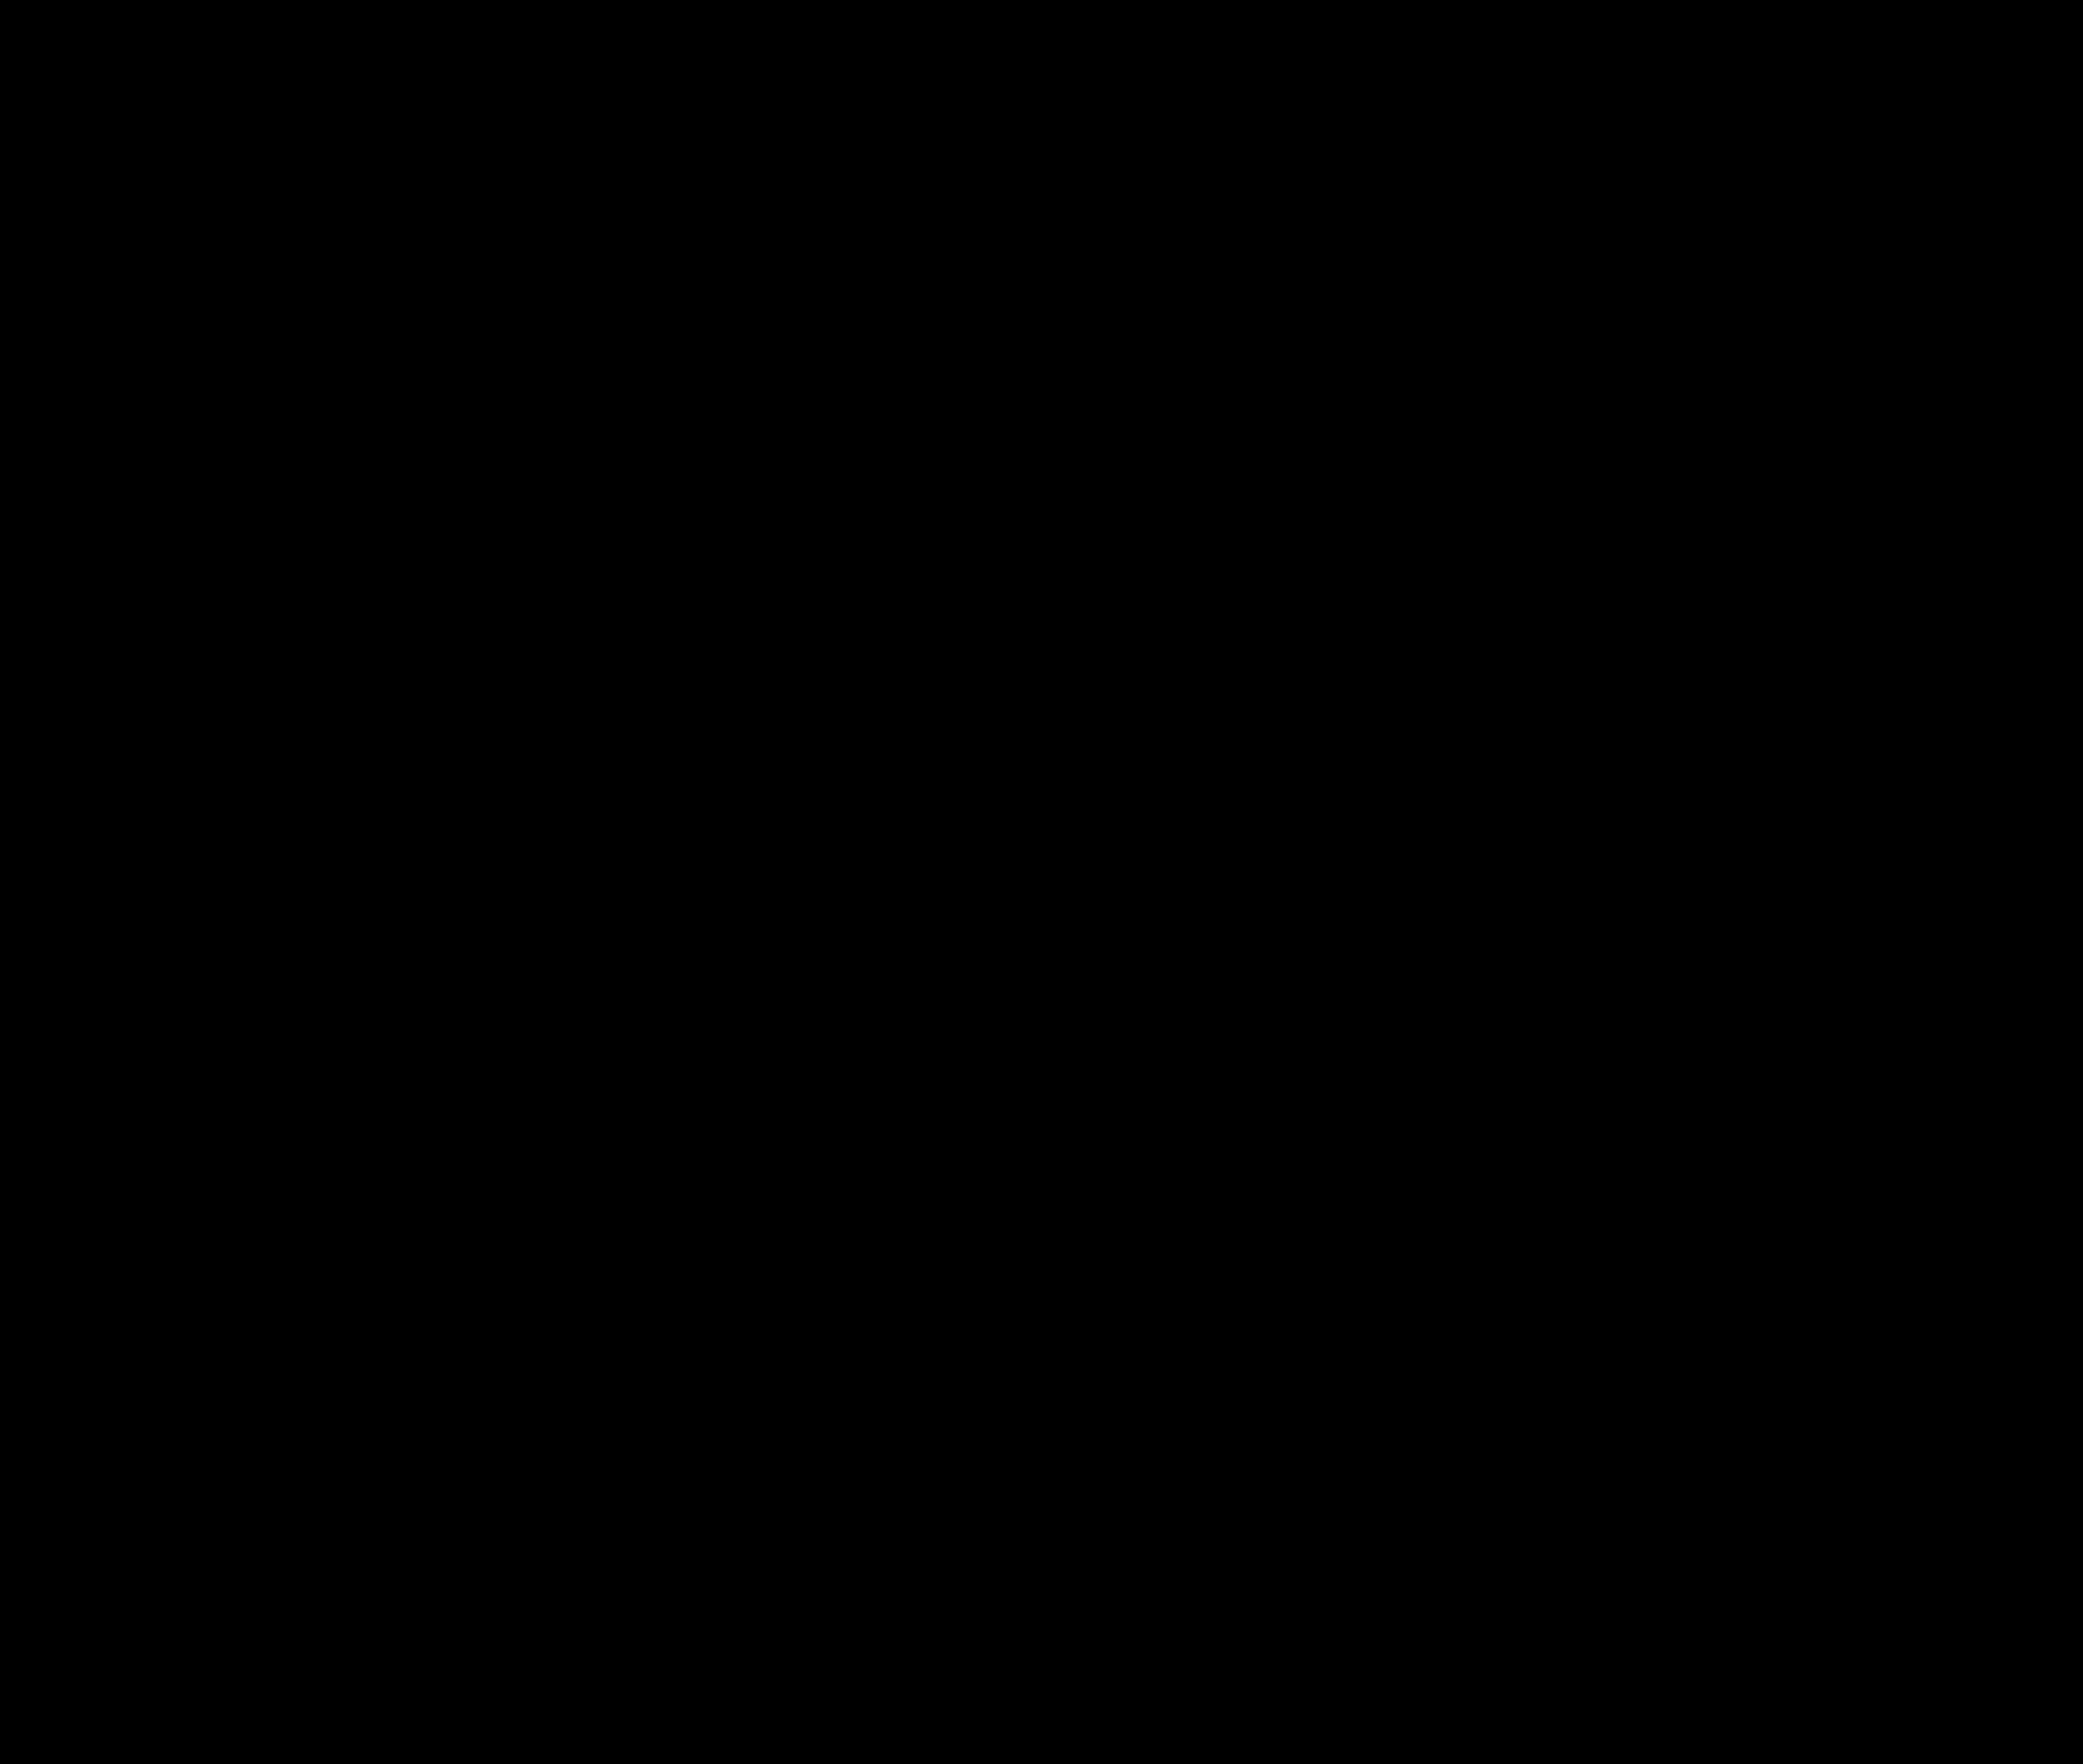 Stunt silhouette big image. Clipart bike bmx bicycle